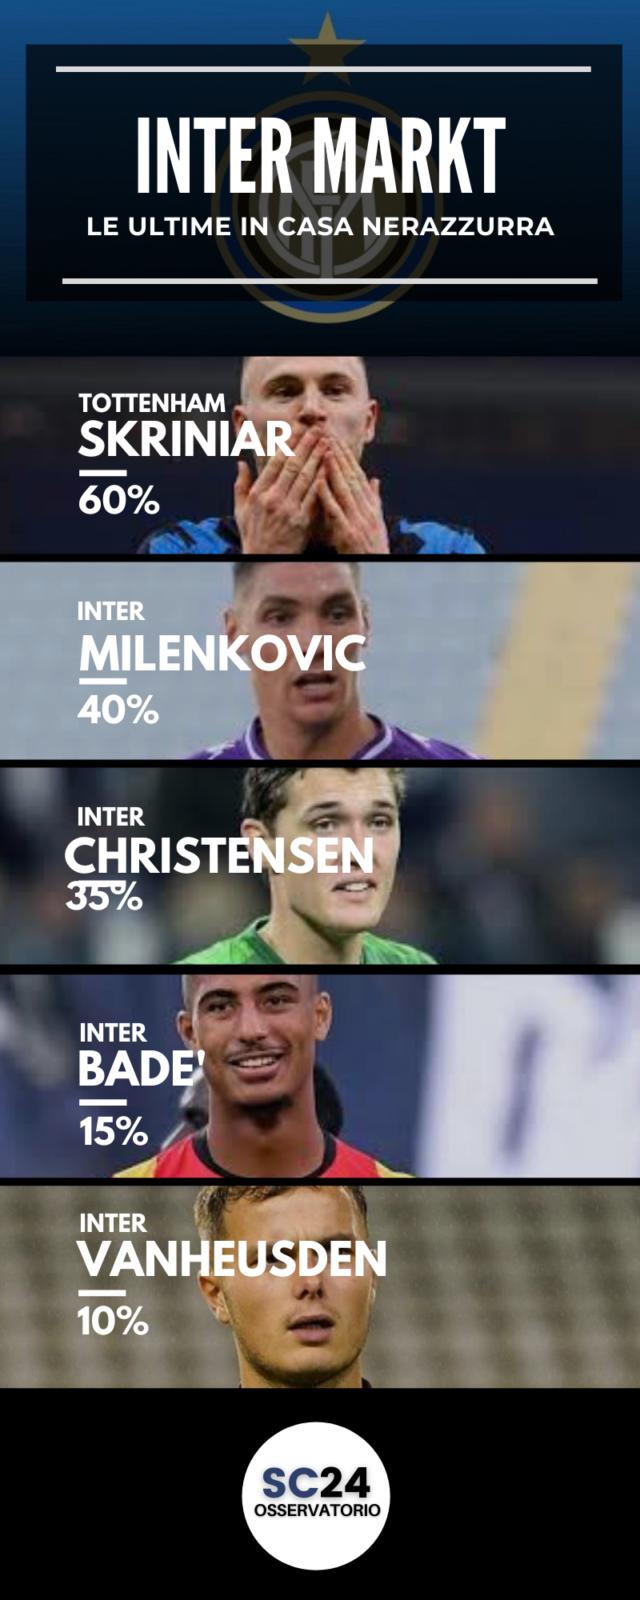 Skriniar-Inter: sarà addio?